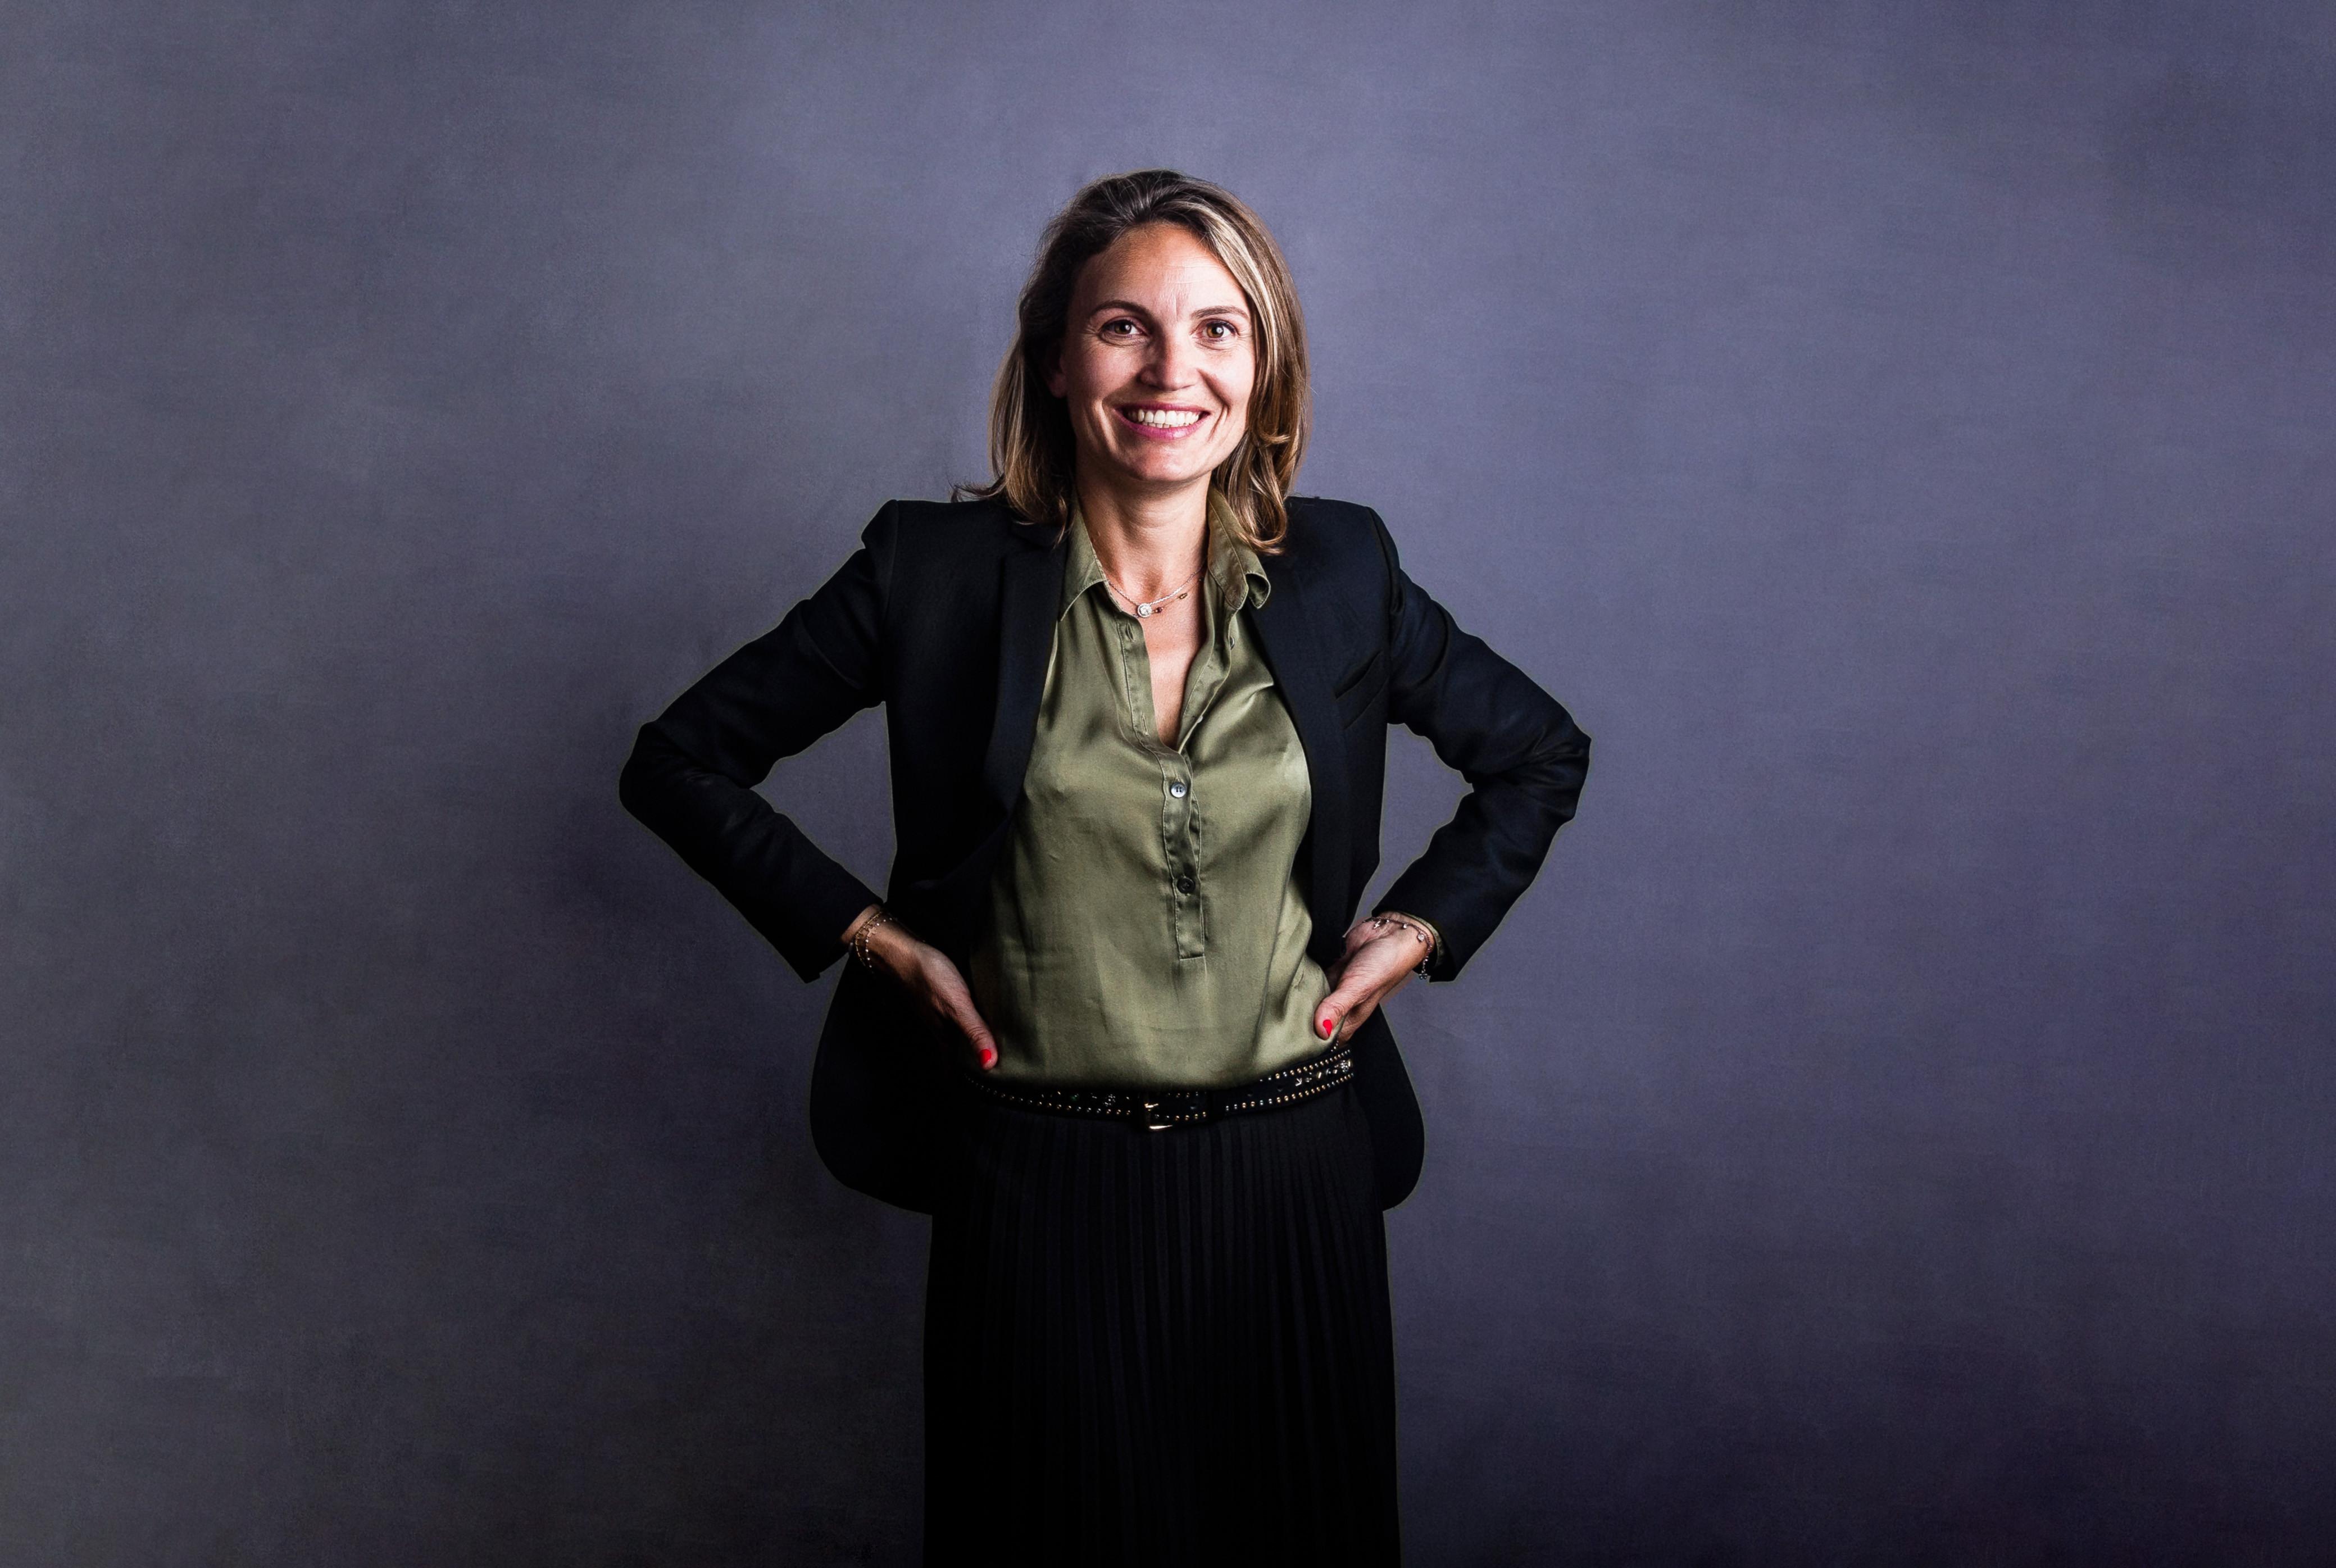 Portrait professionnel au homestudio